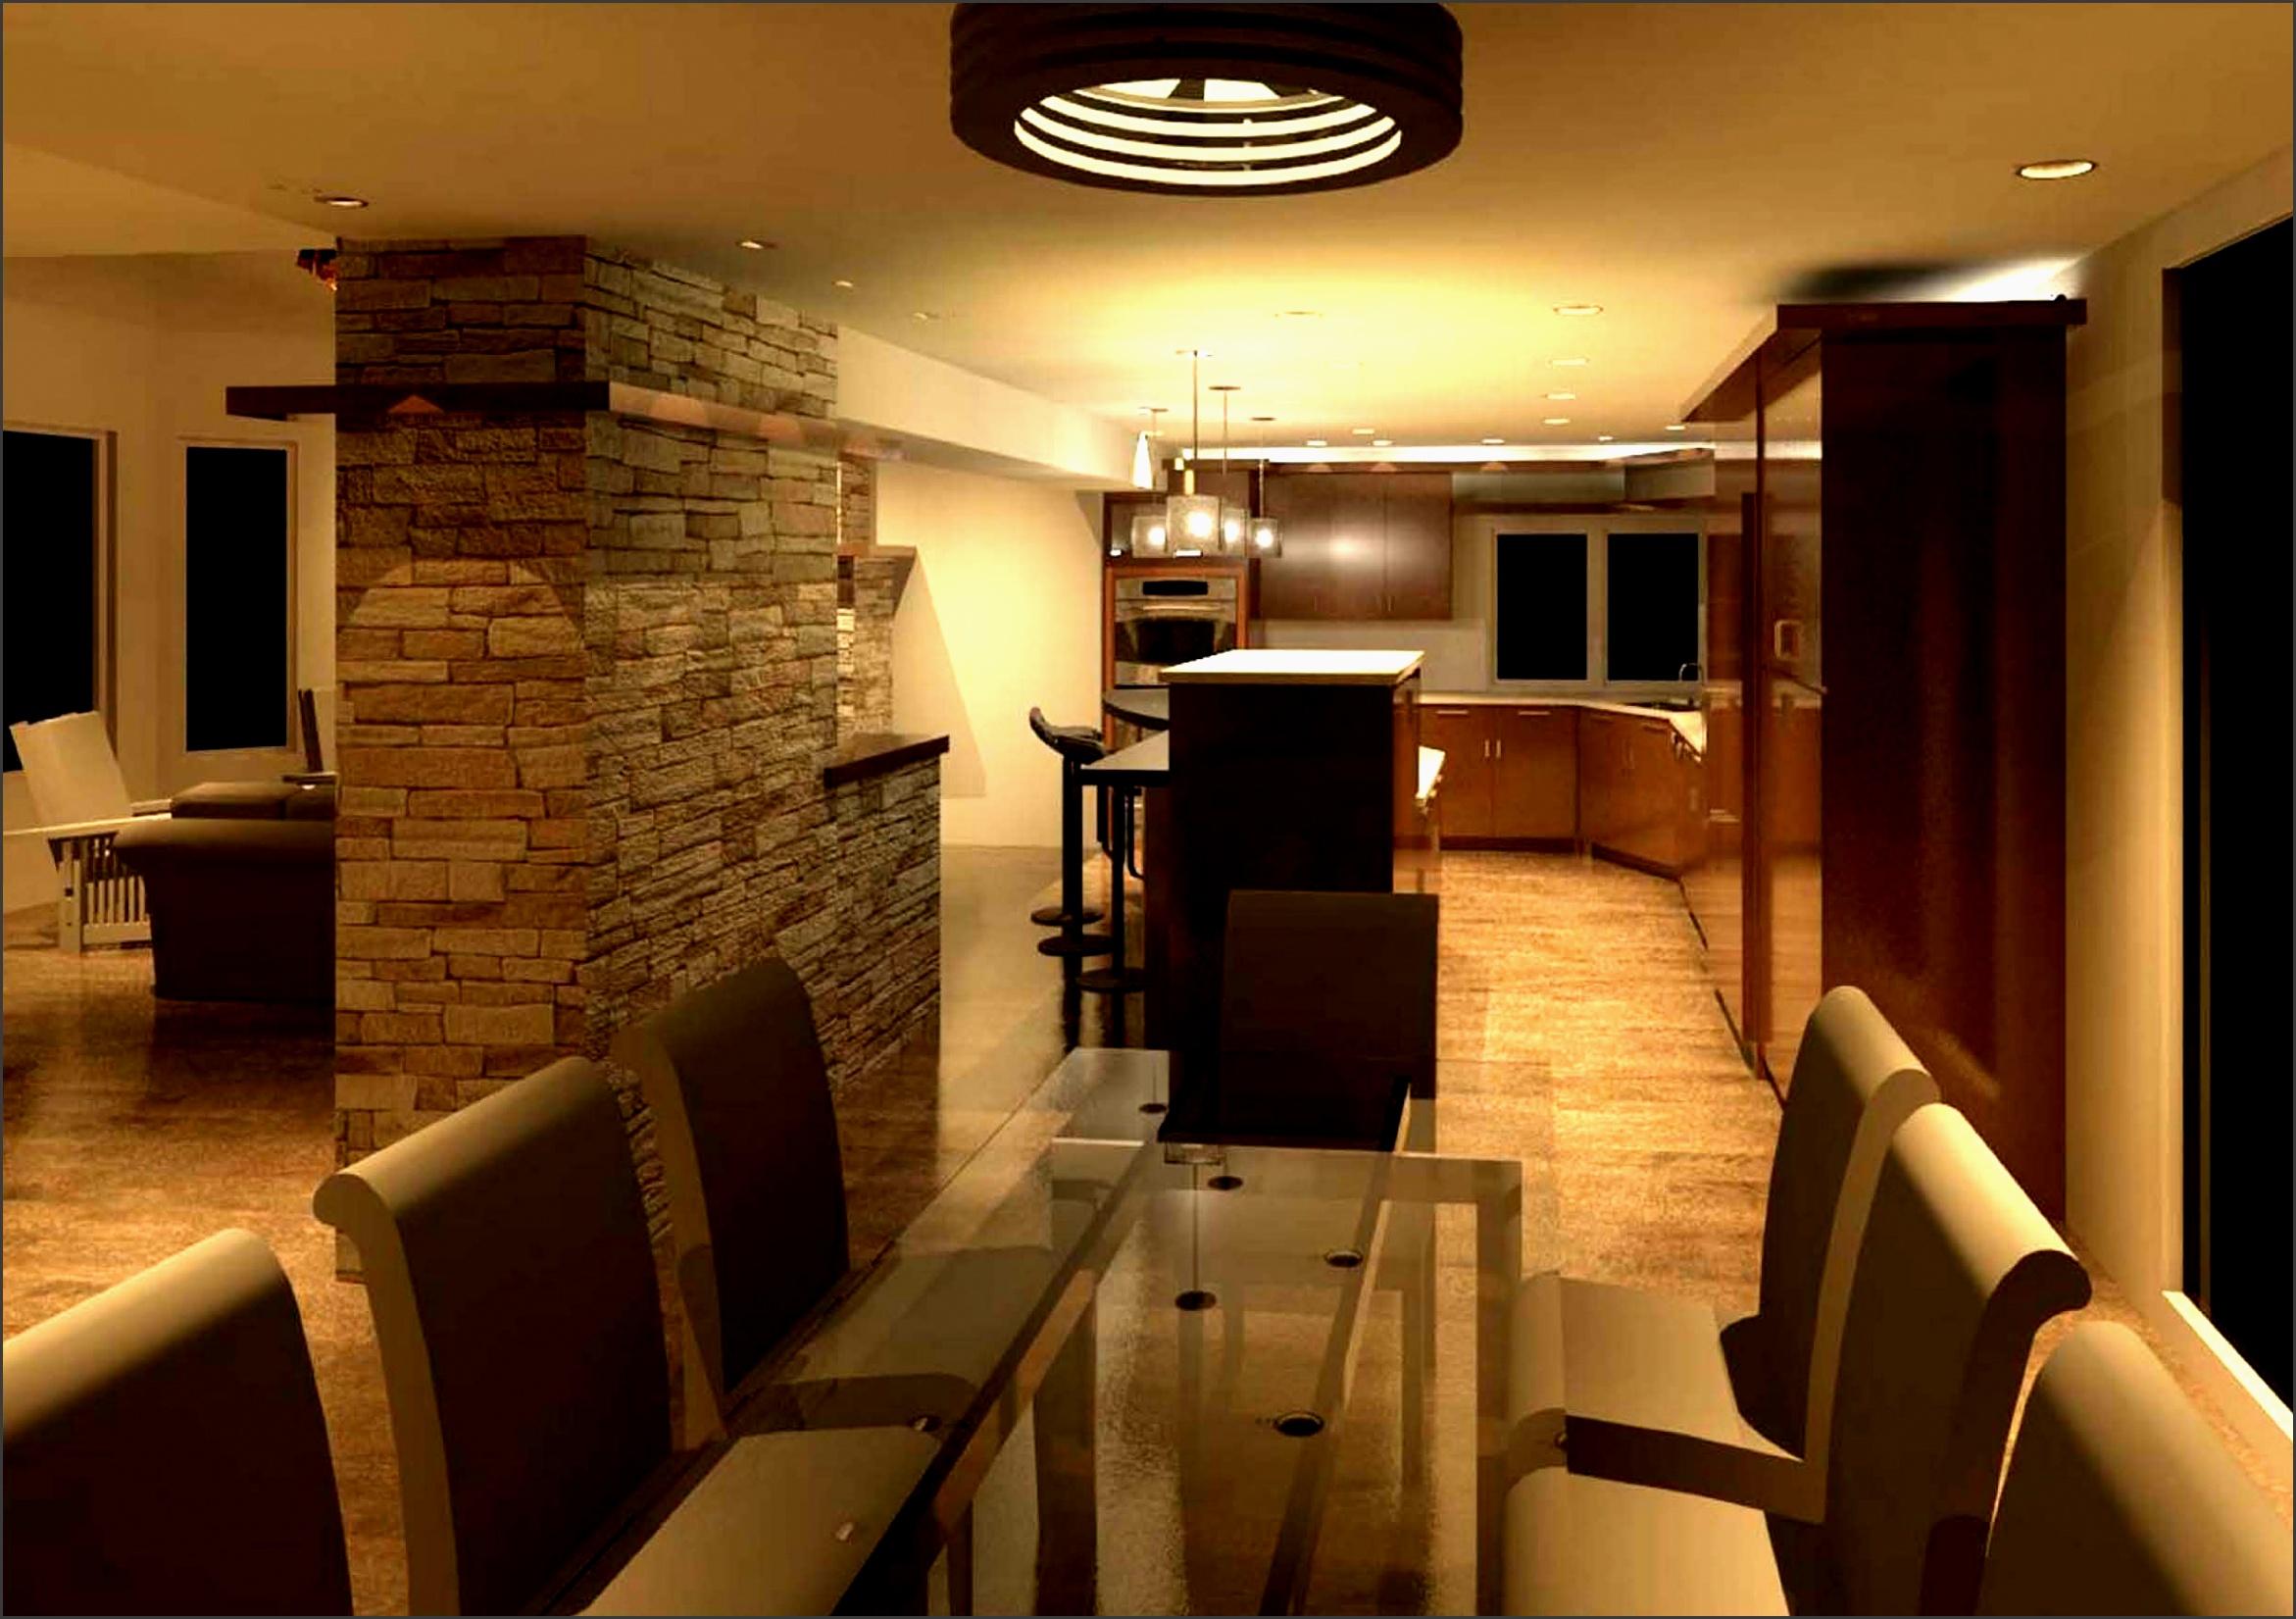 enchanting online room planner free photos best idea home design